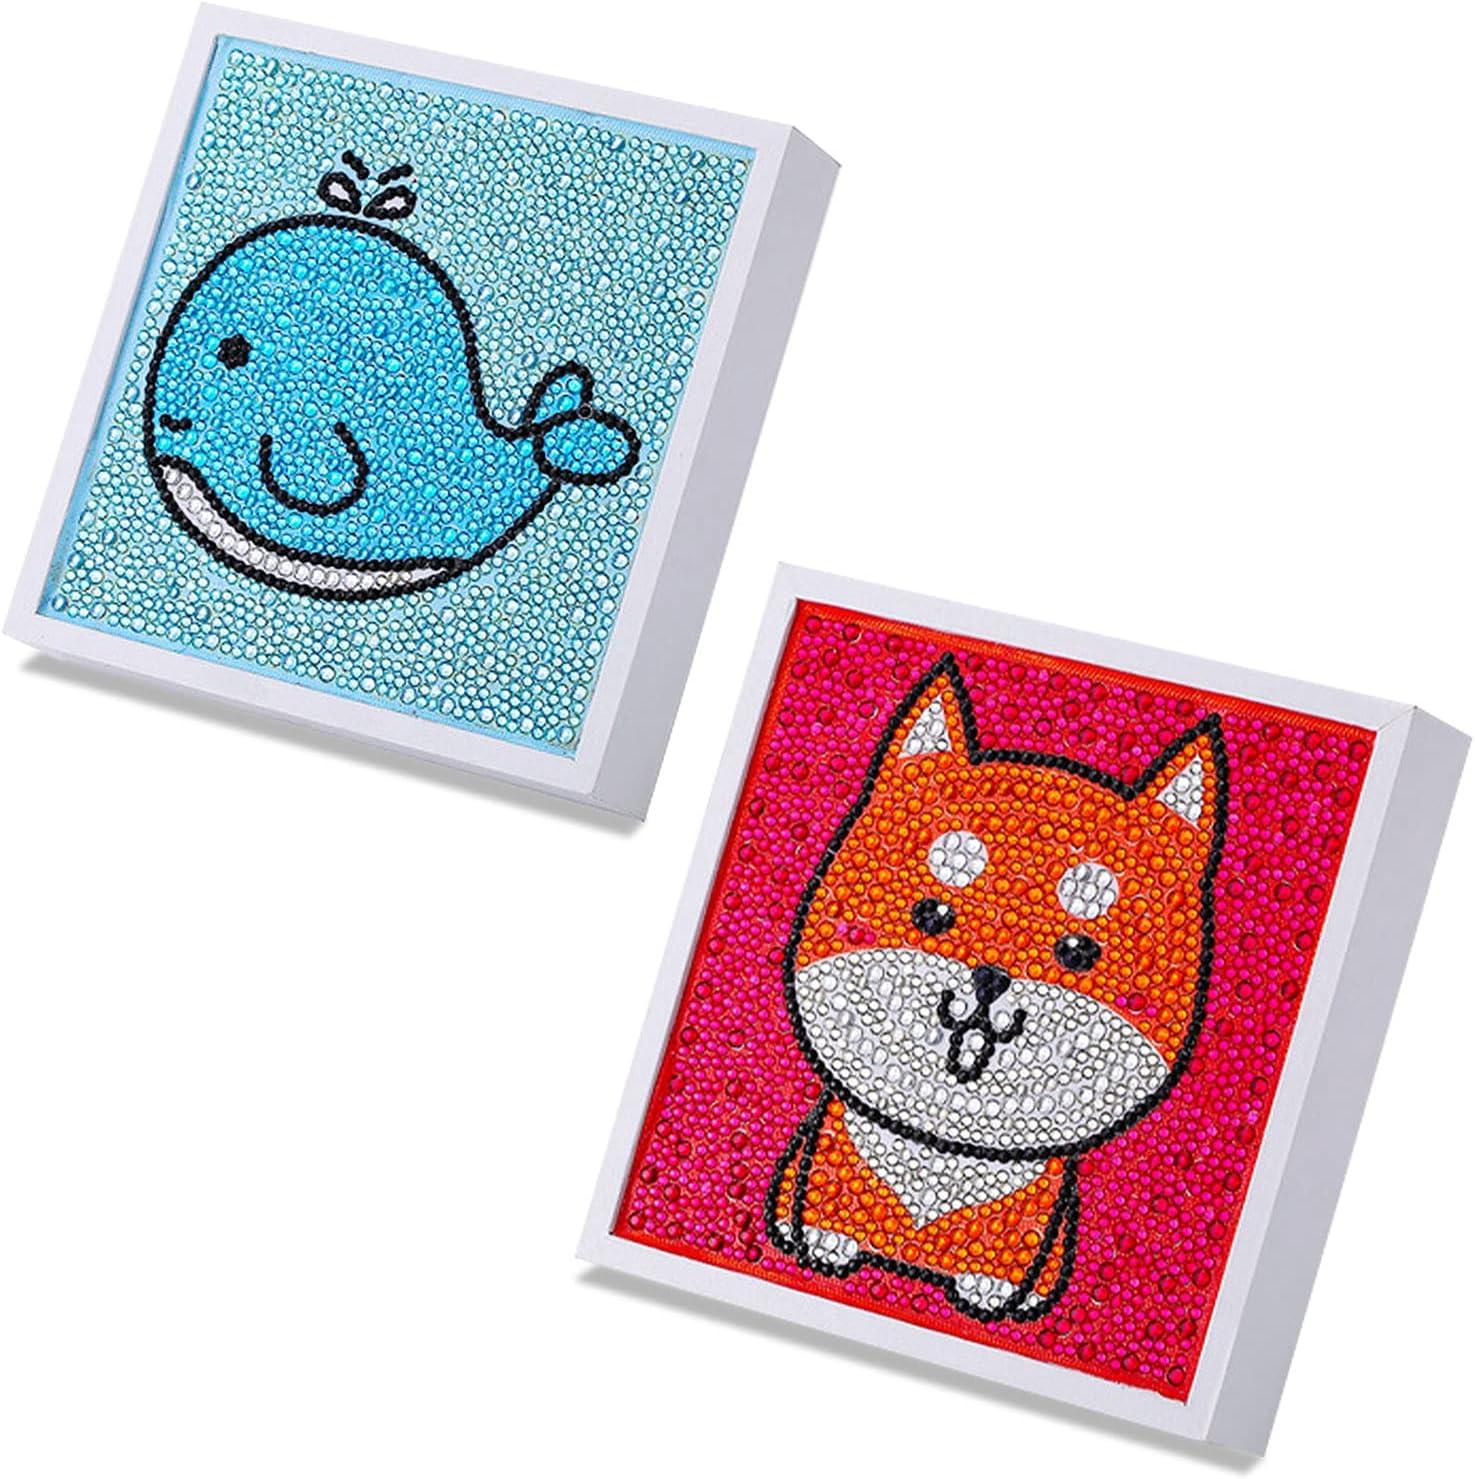 julycofe 2 Max 87% OFF Pack Funny DIY Mosaic Craft 6x6'' 5d - Brilliant Kits New Shipping Free